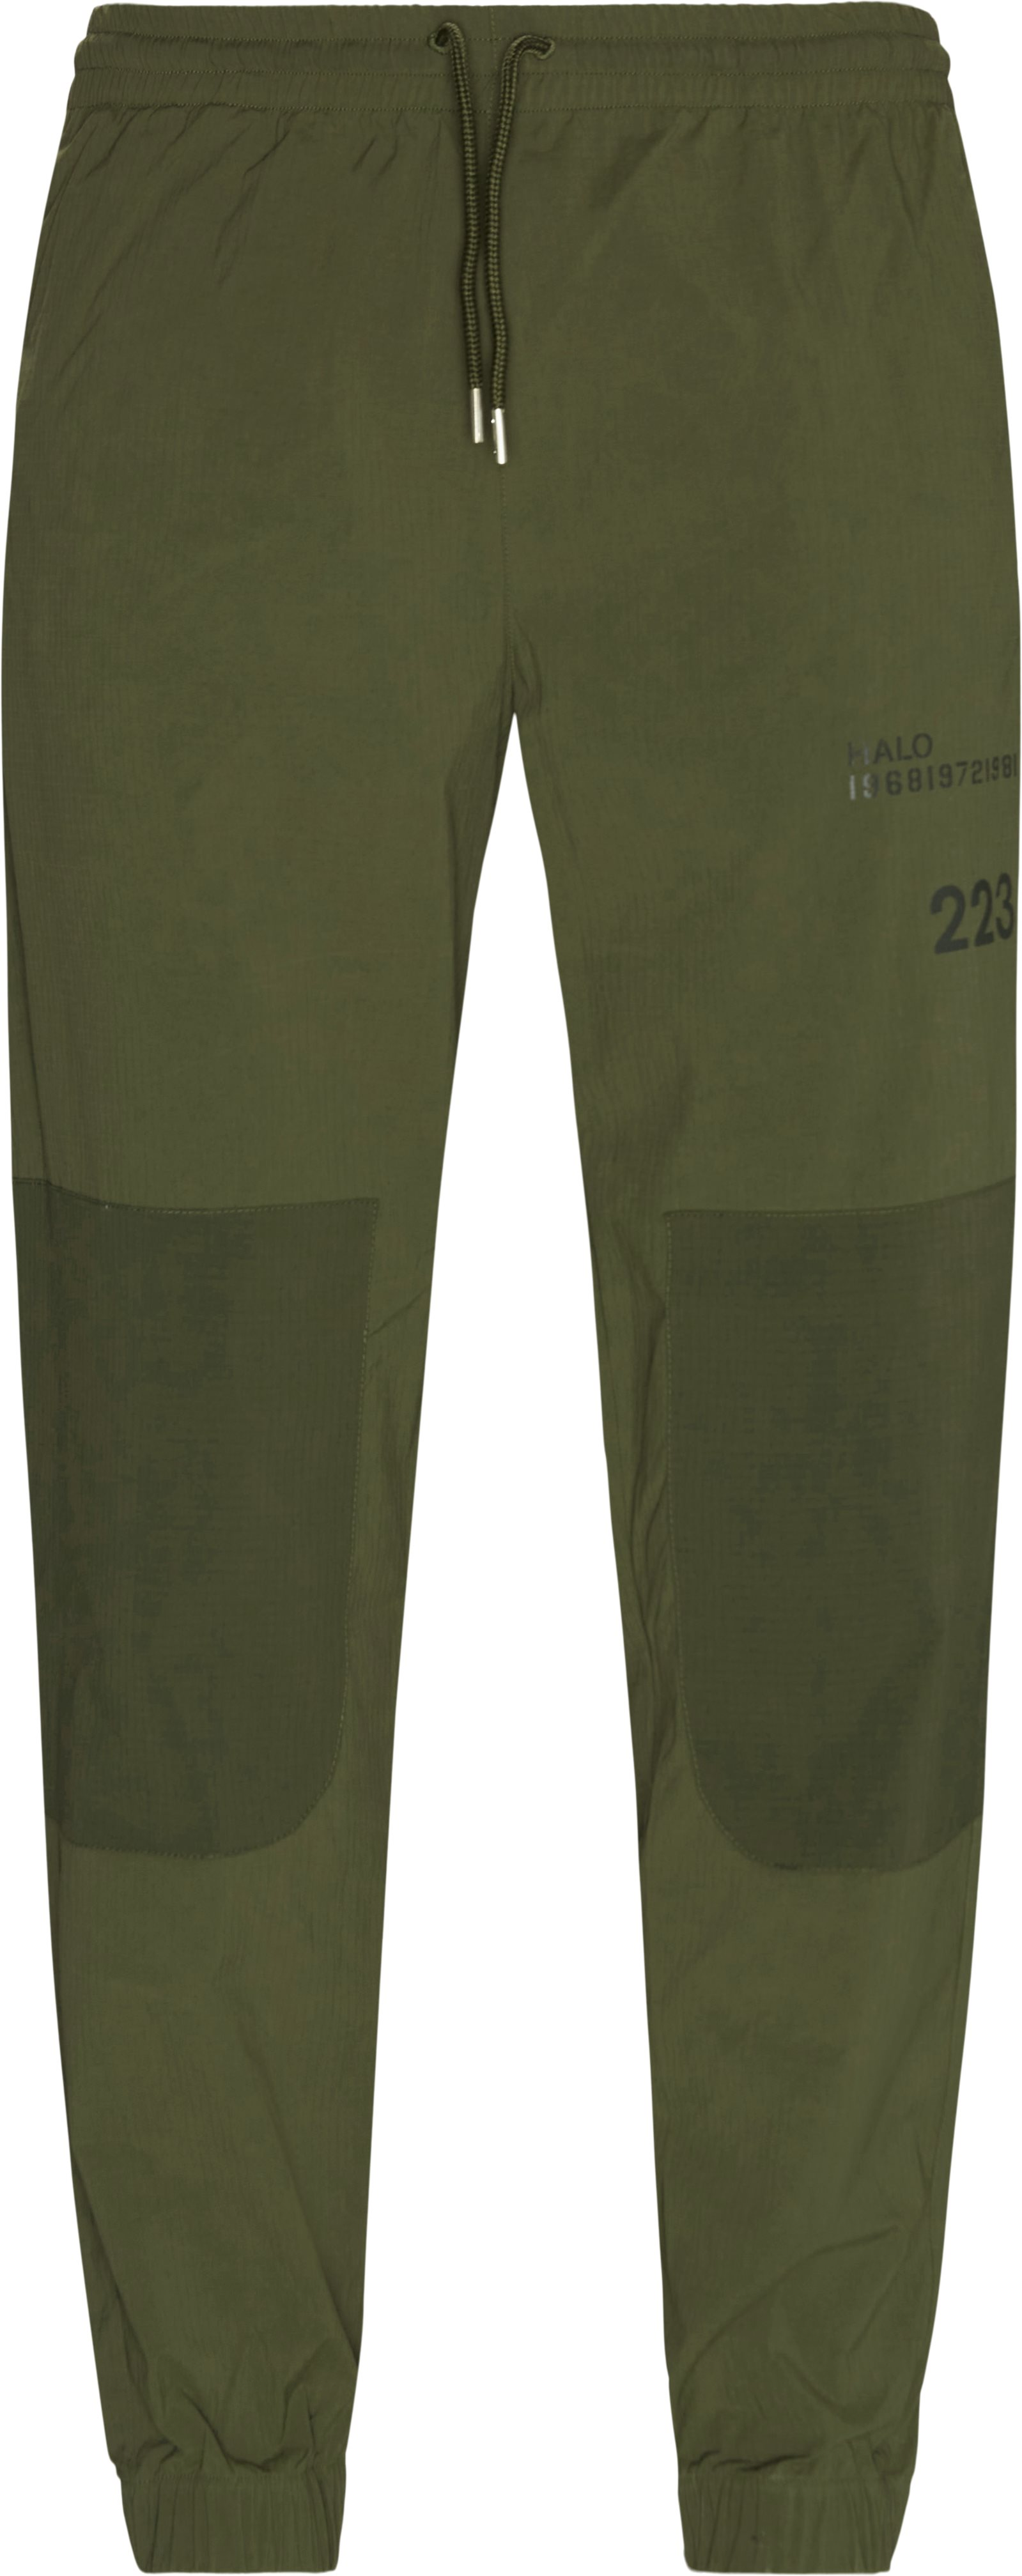 Field Pant - Byxor - Regular fit - Armé